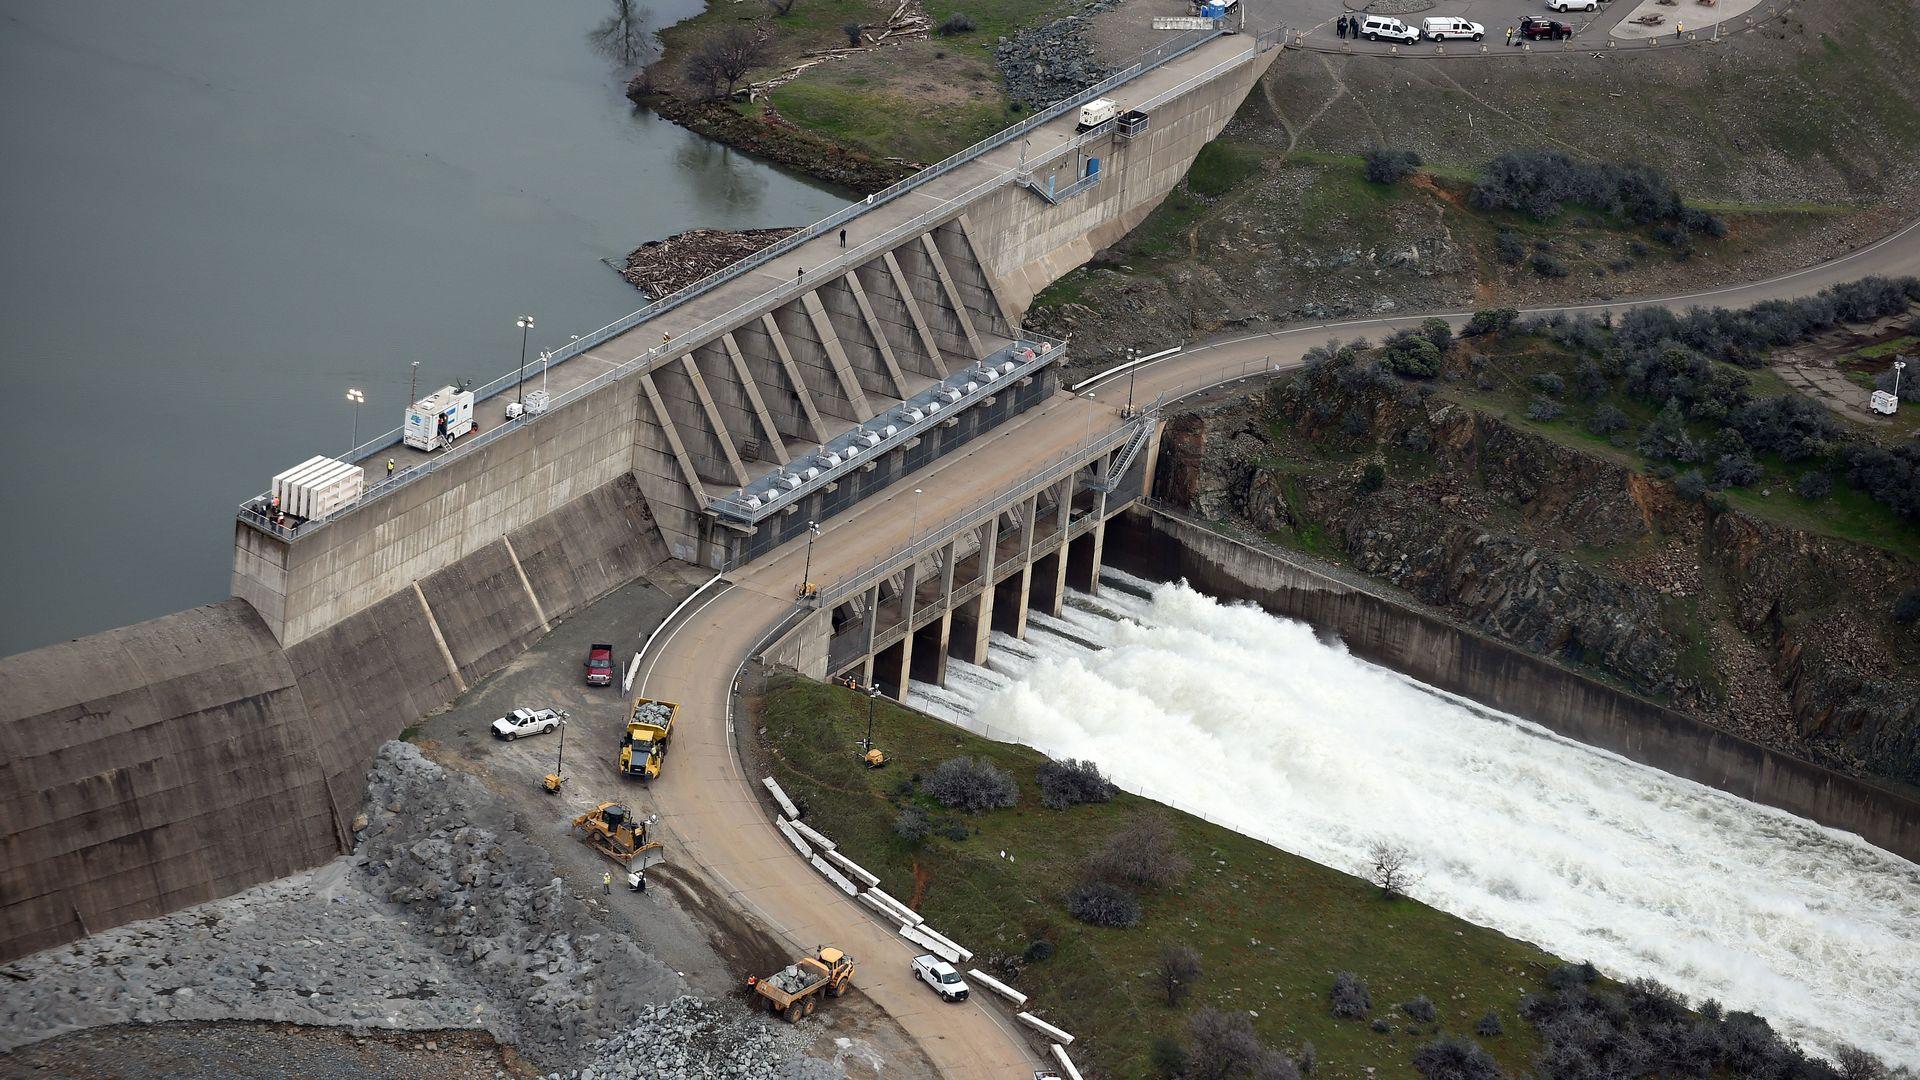 The Oroville Dam in Oroville, California, in 2017.